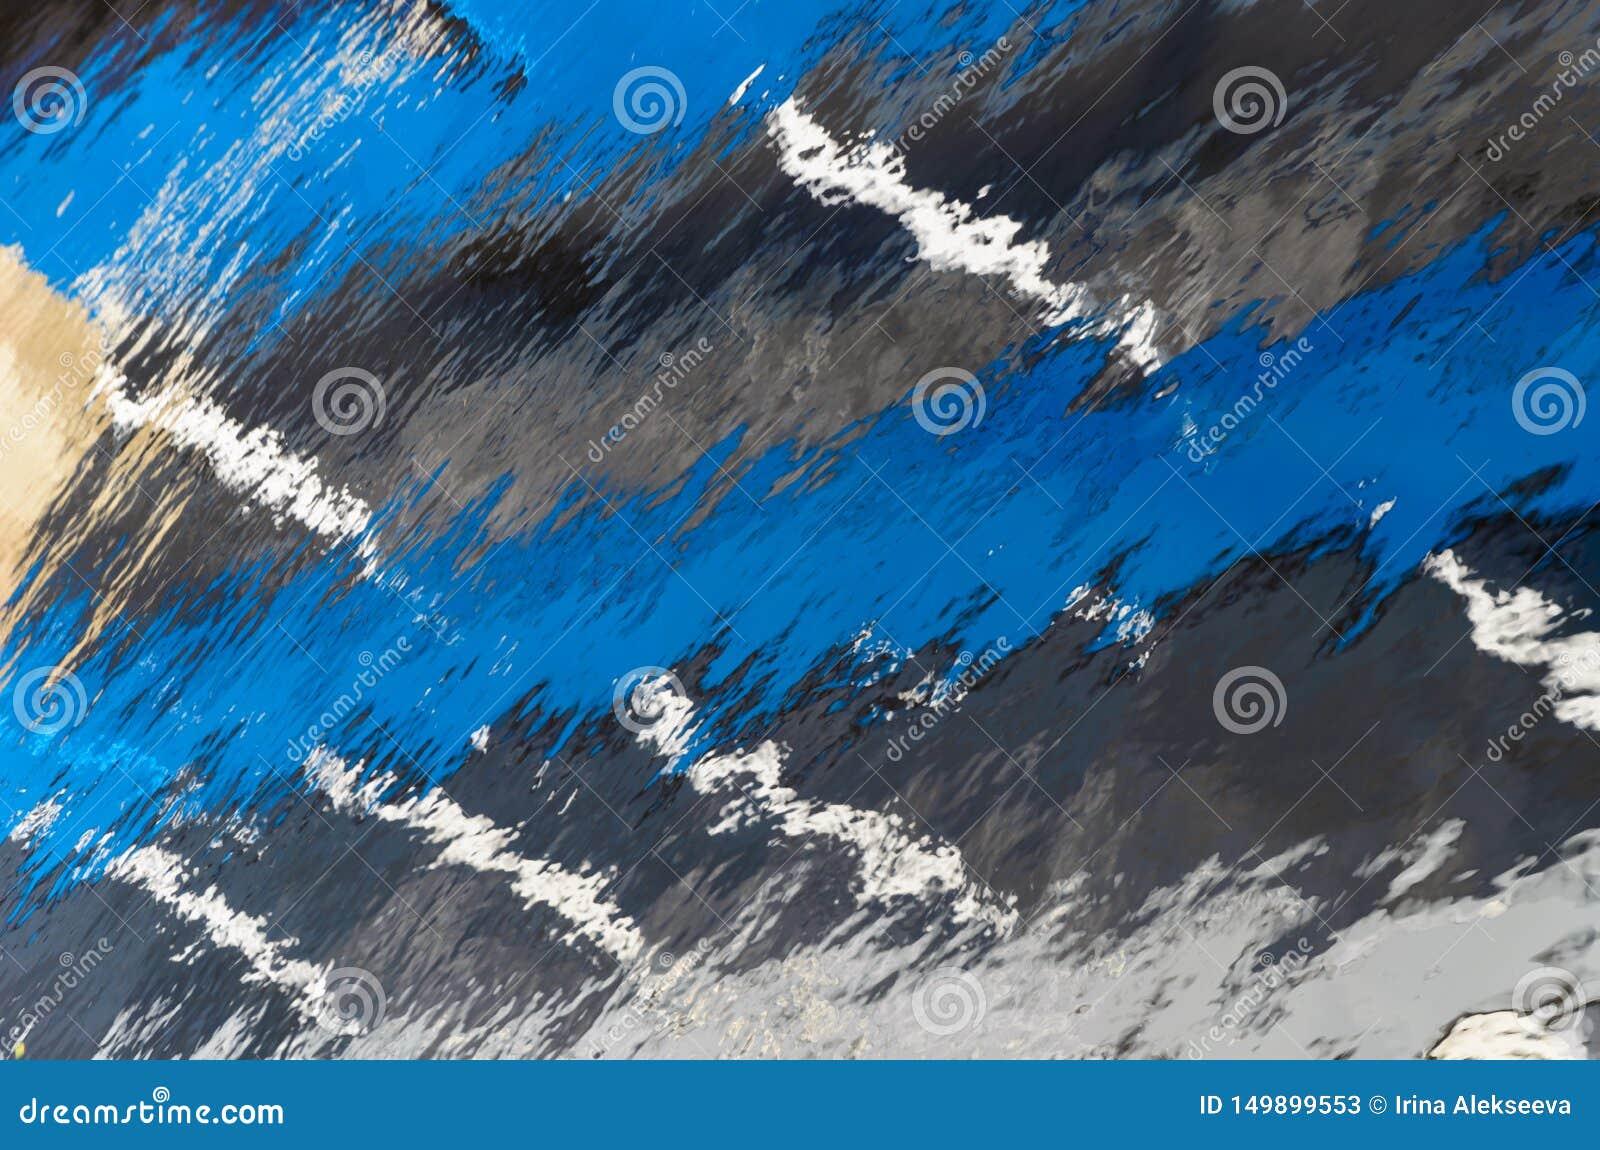 Reflexión en agua con las rayas blancas azules y finas anchas Fondo natural abstracto